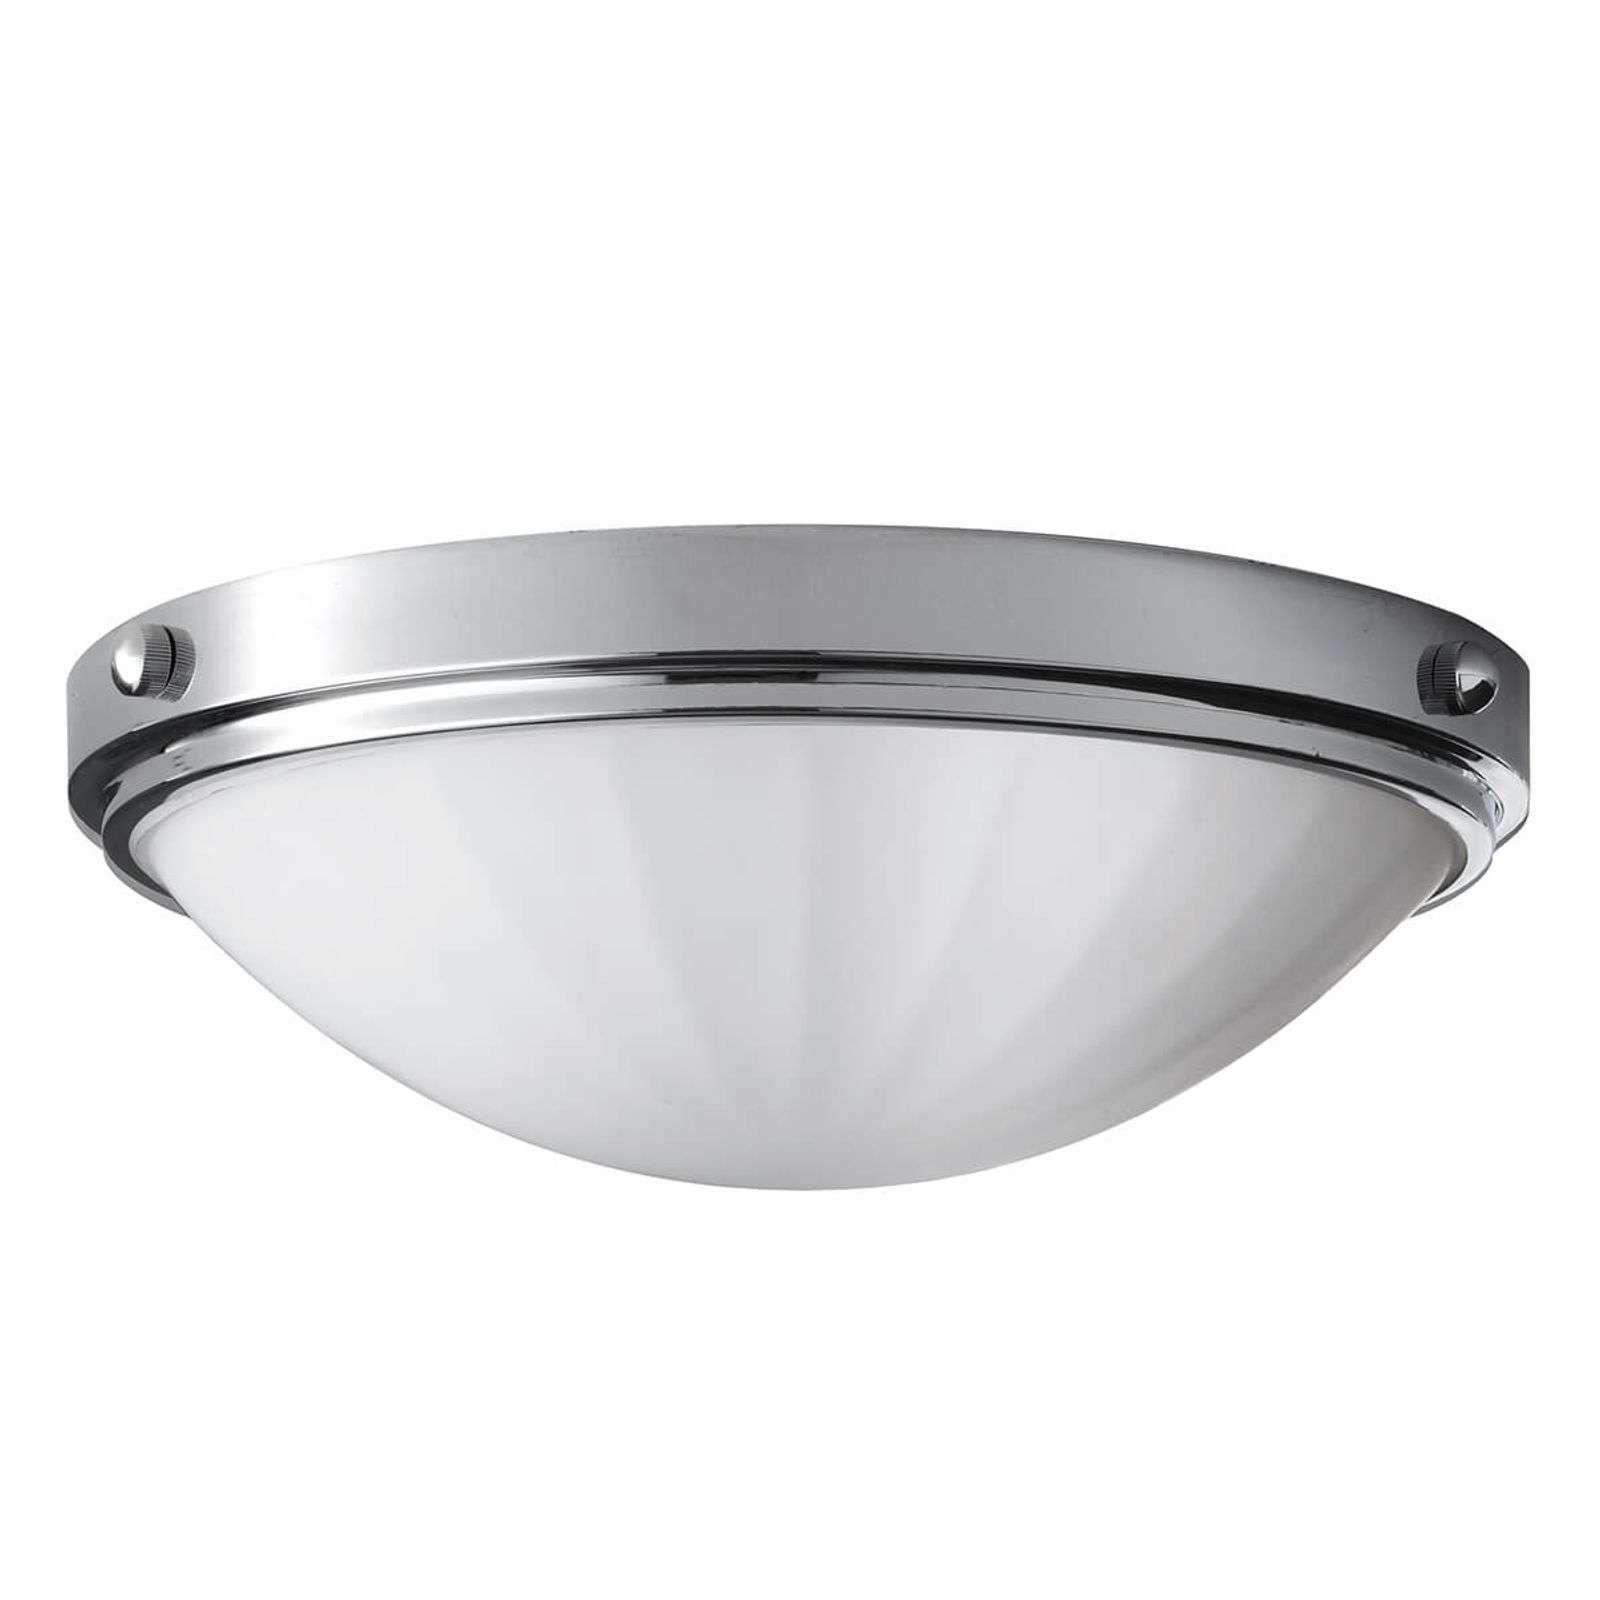 Plafondlamp Perry Voor Badkamers Plafondlamp Lampen Plafond Lampenkappen